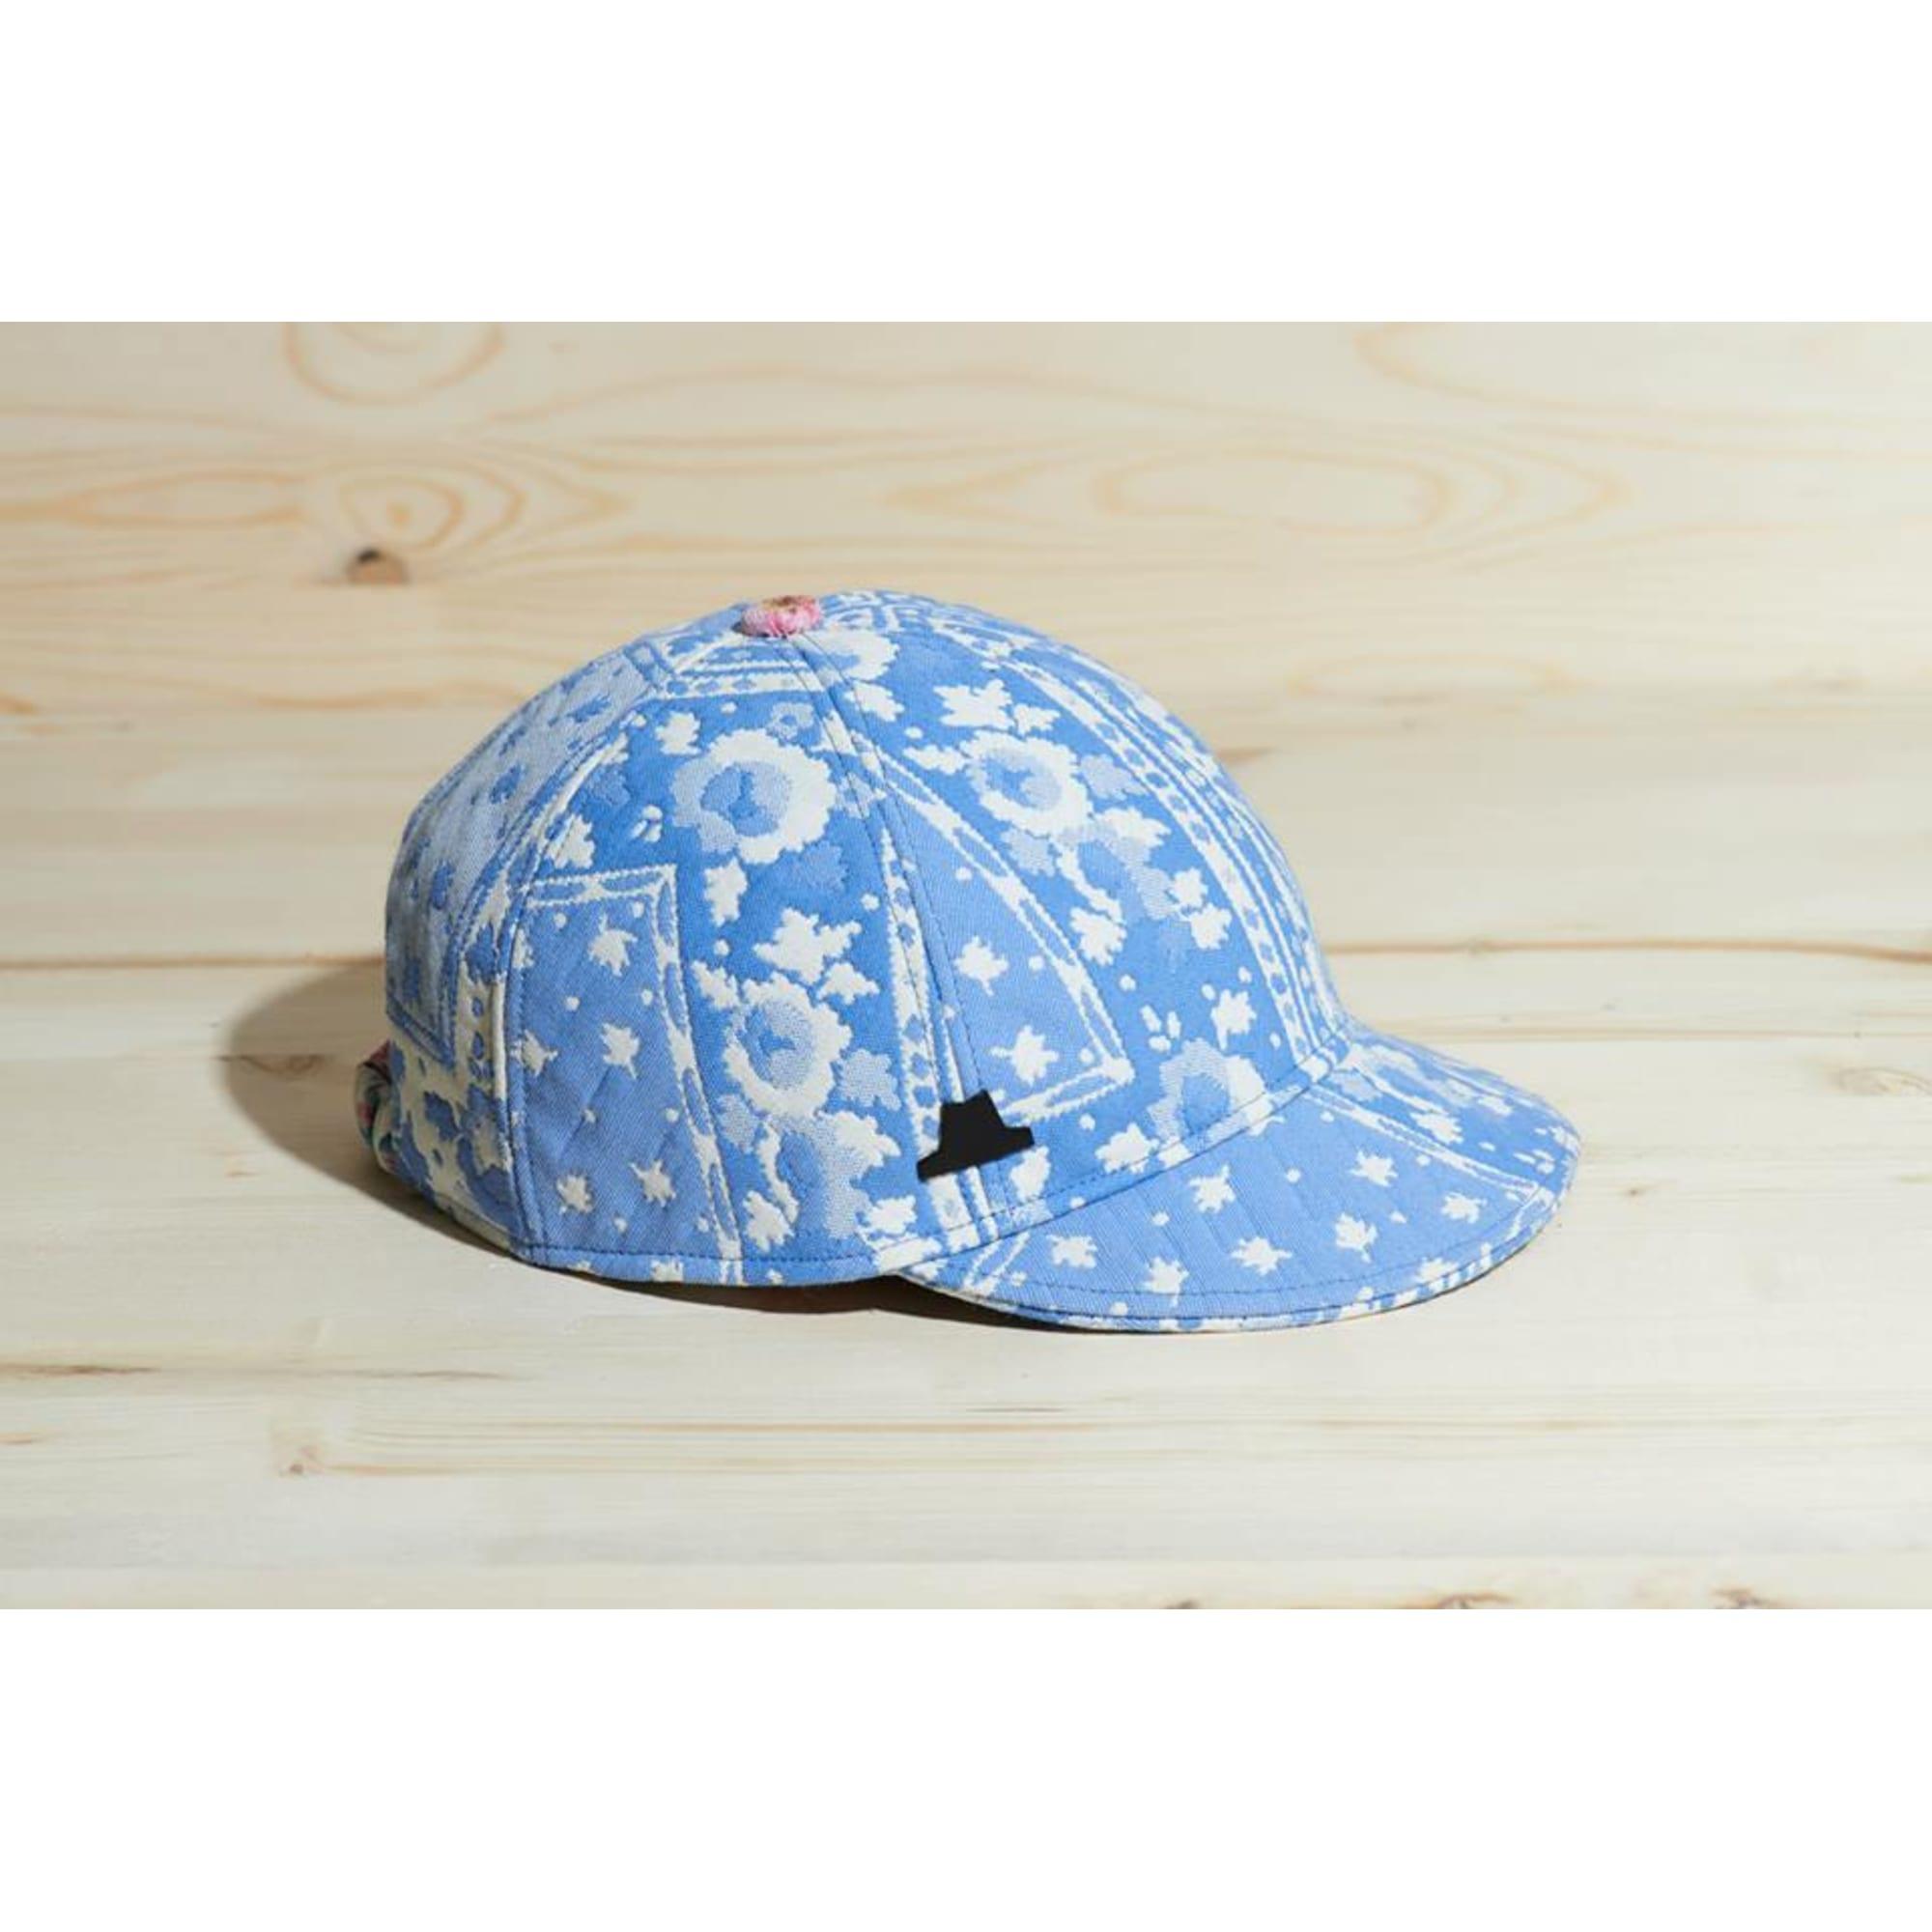 Casquette SHAPOBAA Bleu, bleu marine, bleu turquoise